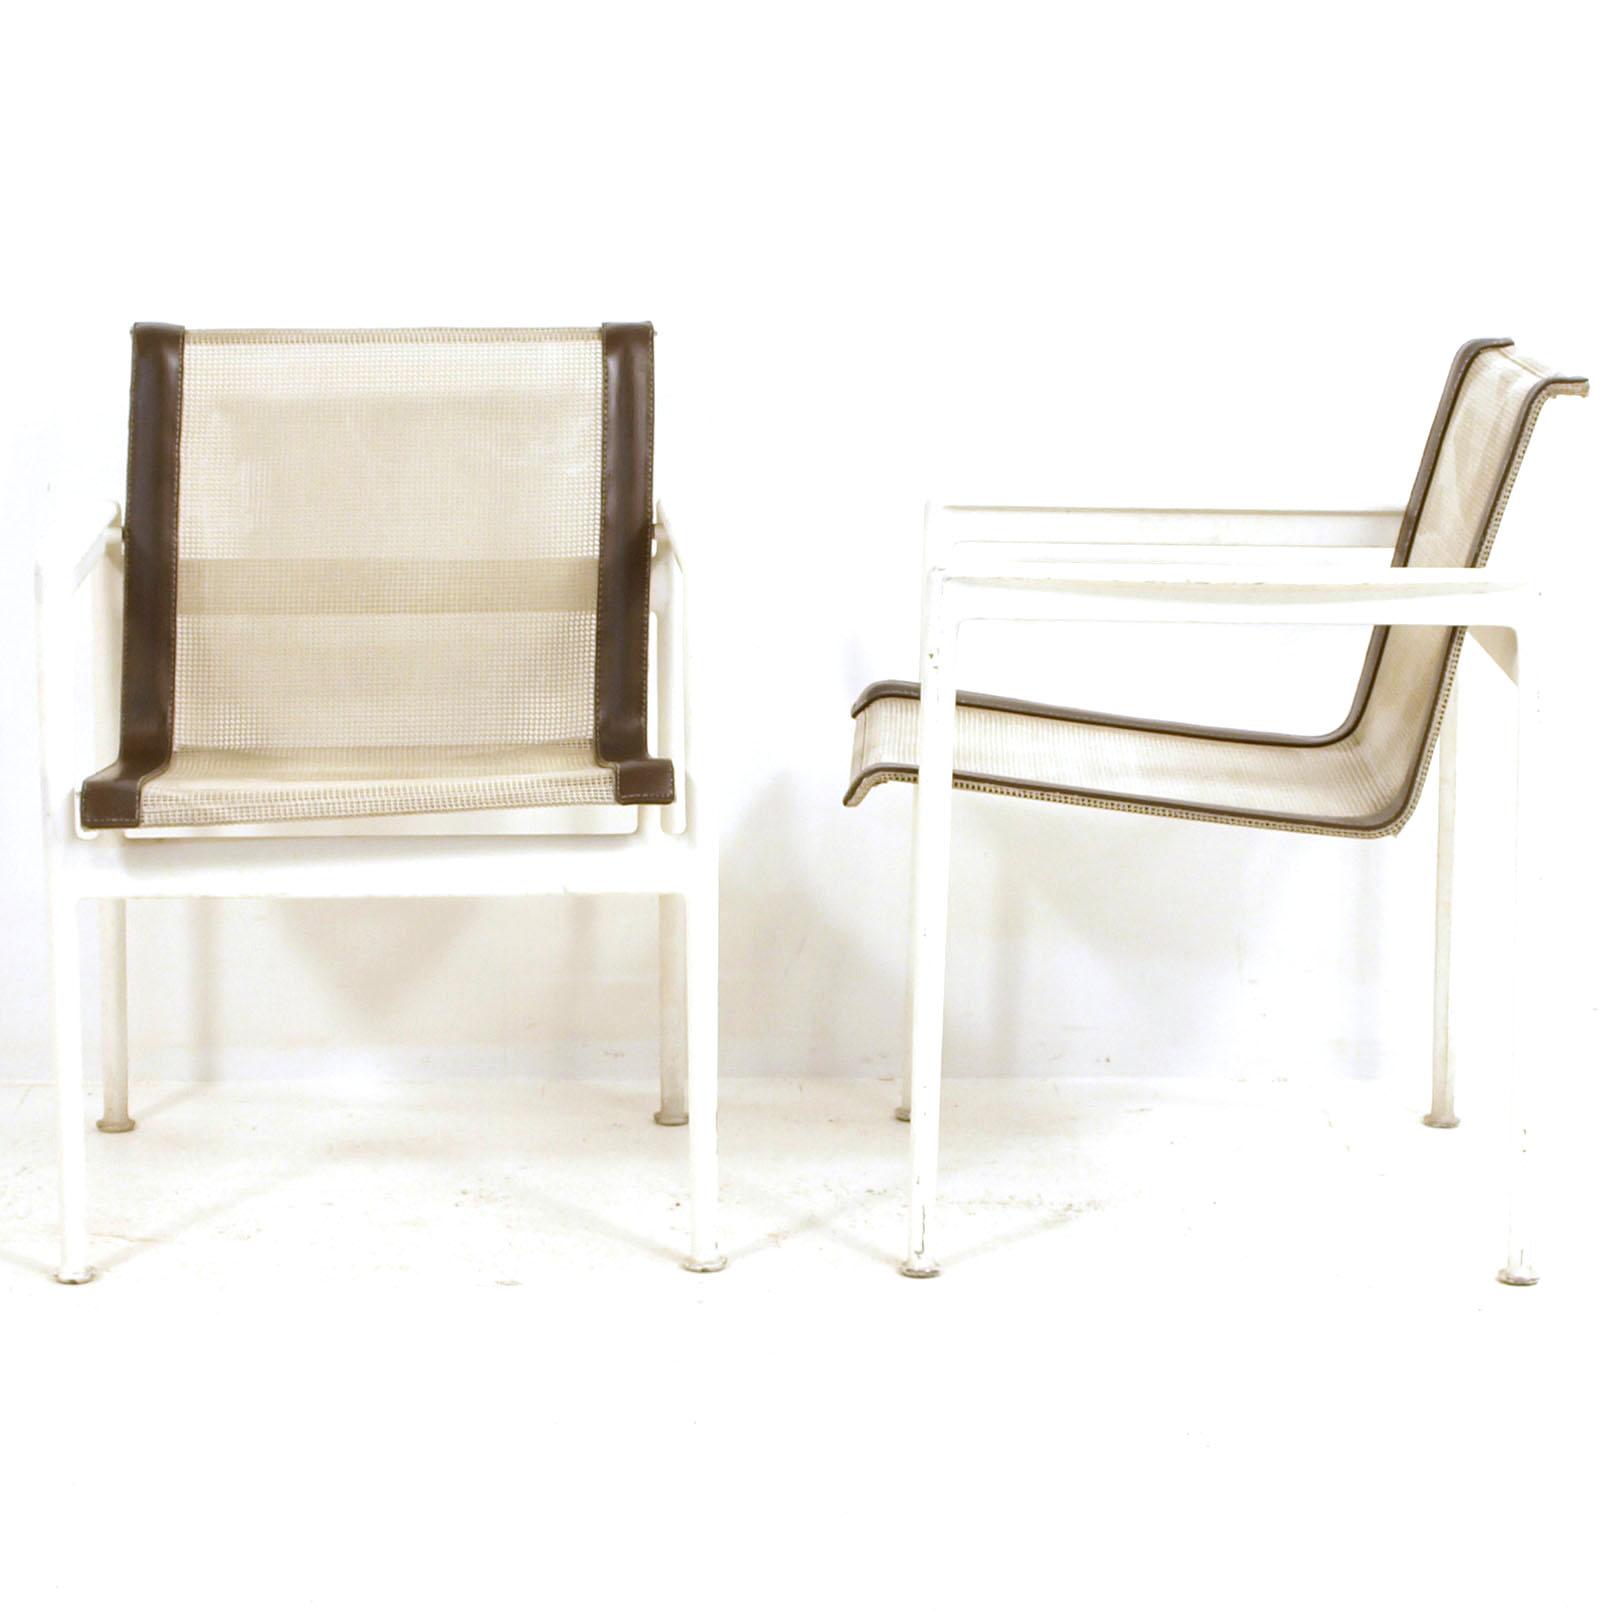 gartensessel von richard schultz m bel z rich vintagem bel. Black Bedroom Furniture Sets. Home Design Ideas